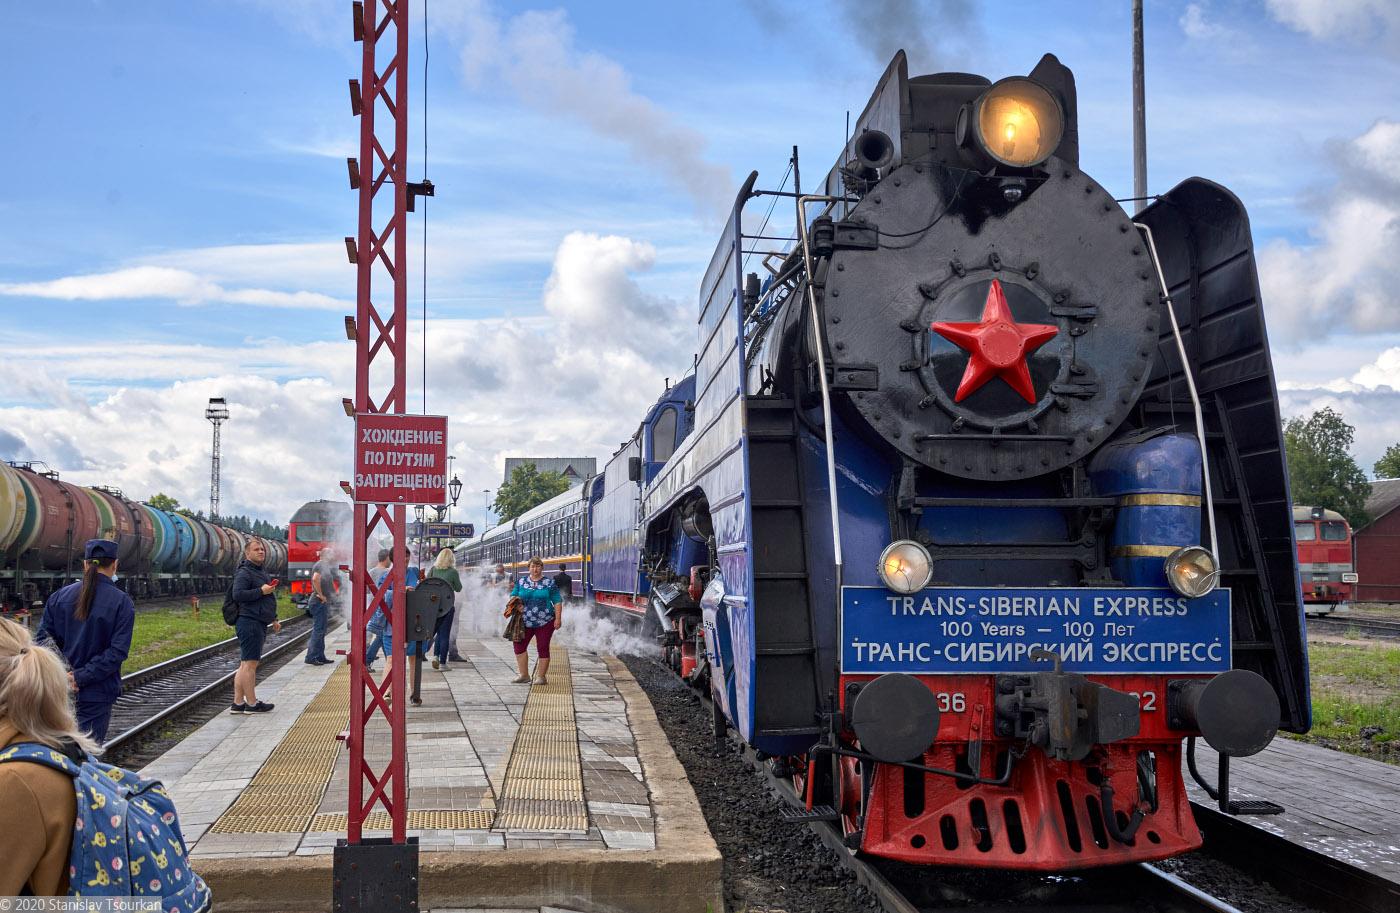 Карелия, республика Карелия, Сортавала, russia, karjala, sortavala, станция сортавала, железная дорога, паровоз